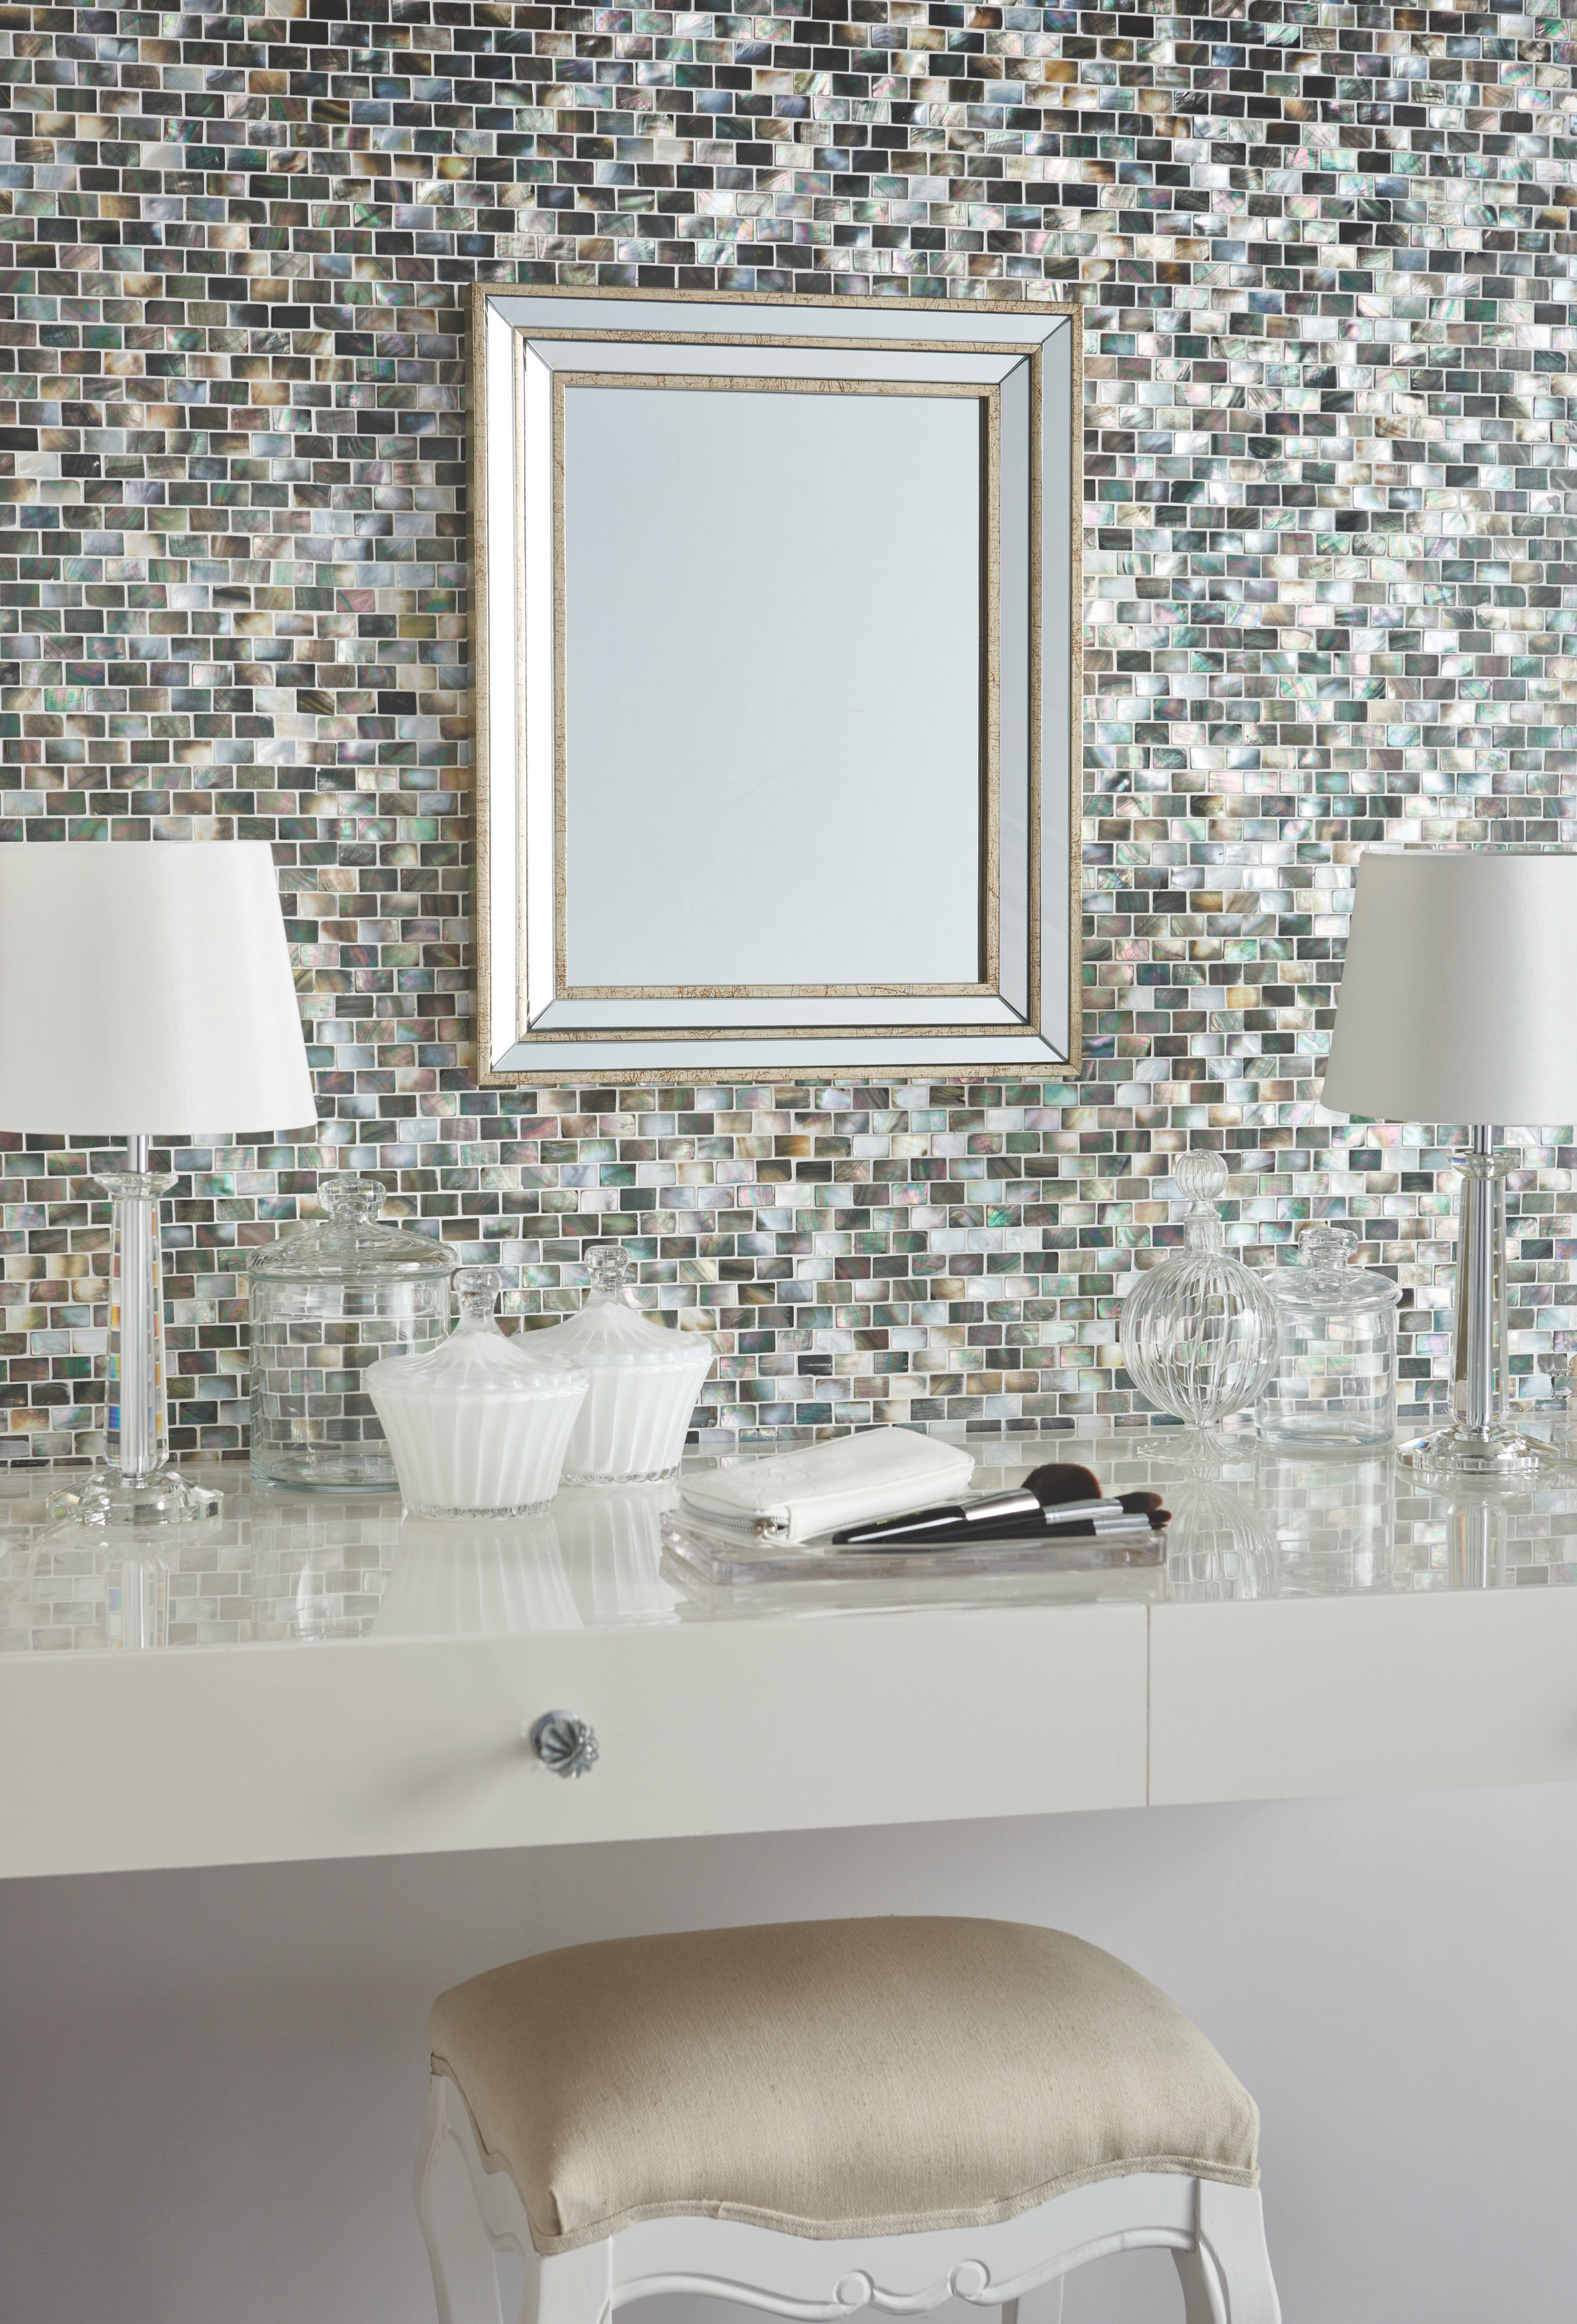 Original Style_Mosaics_Mother of Pearl BrickbondEW-MOPDBBMOS.jpg